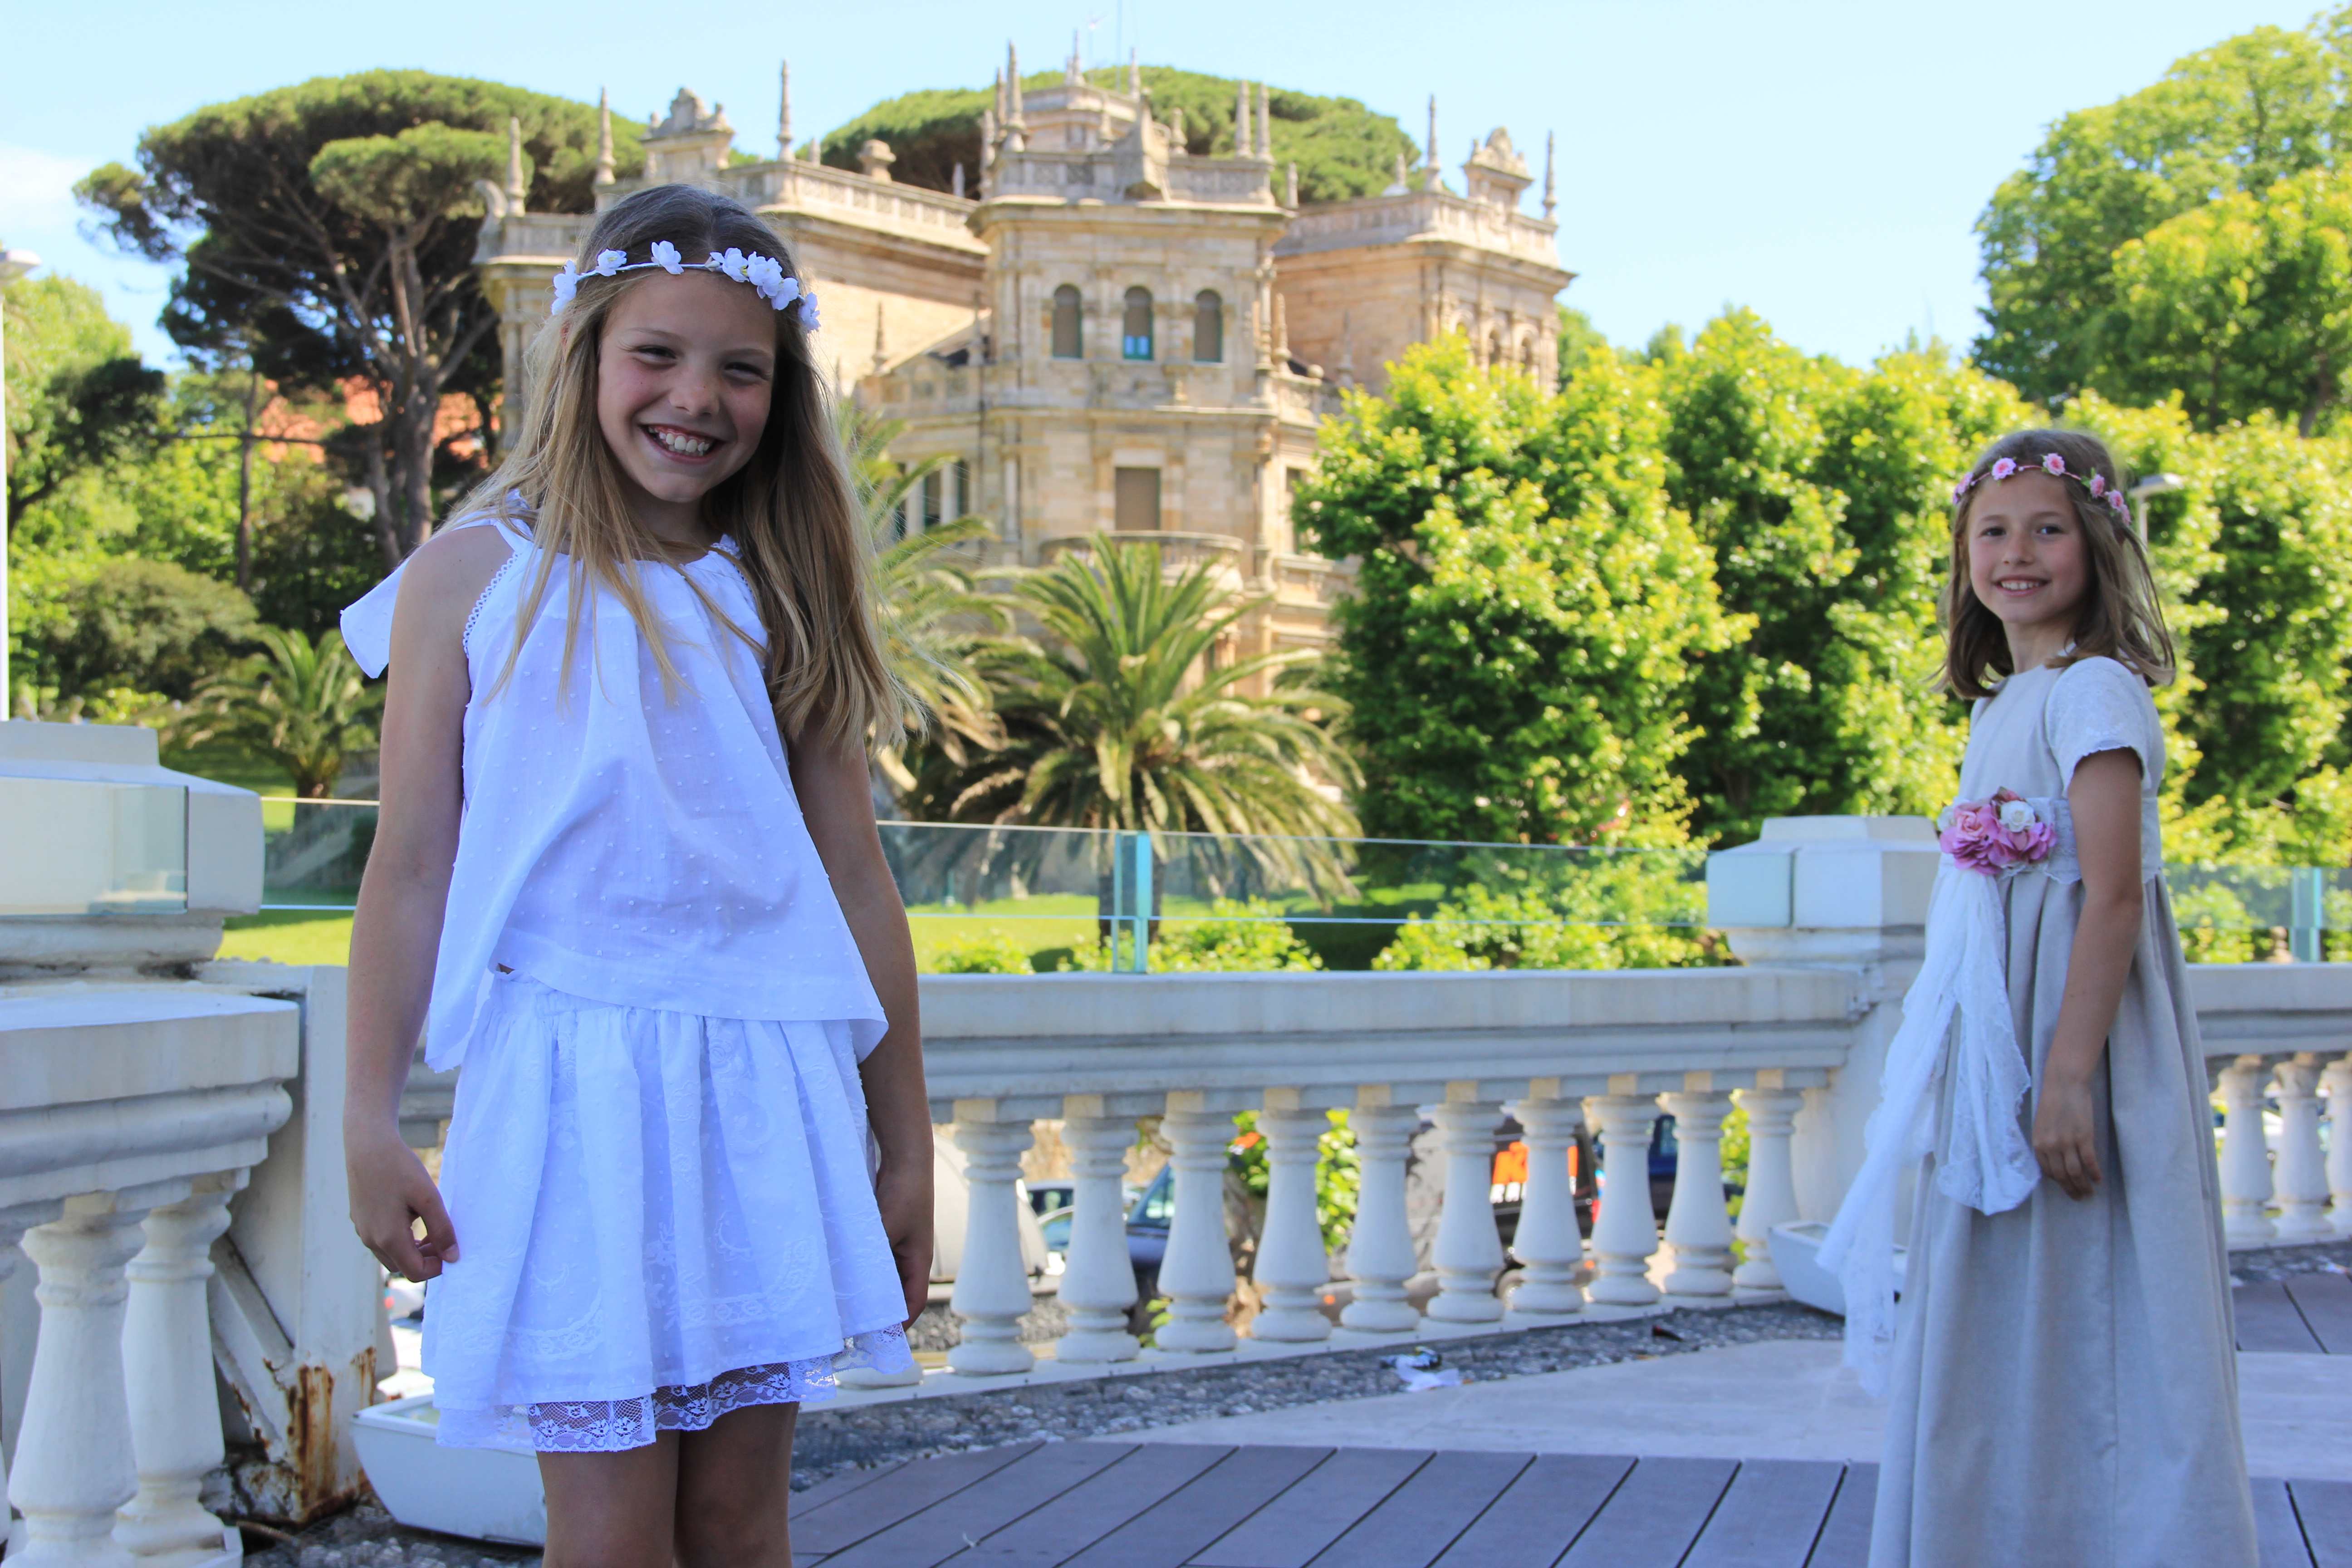 Falda de plumeti bordado, conjunto de ceremonia niña, boda ibicenca niña, ropa blanca verano niña